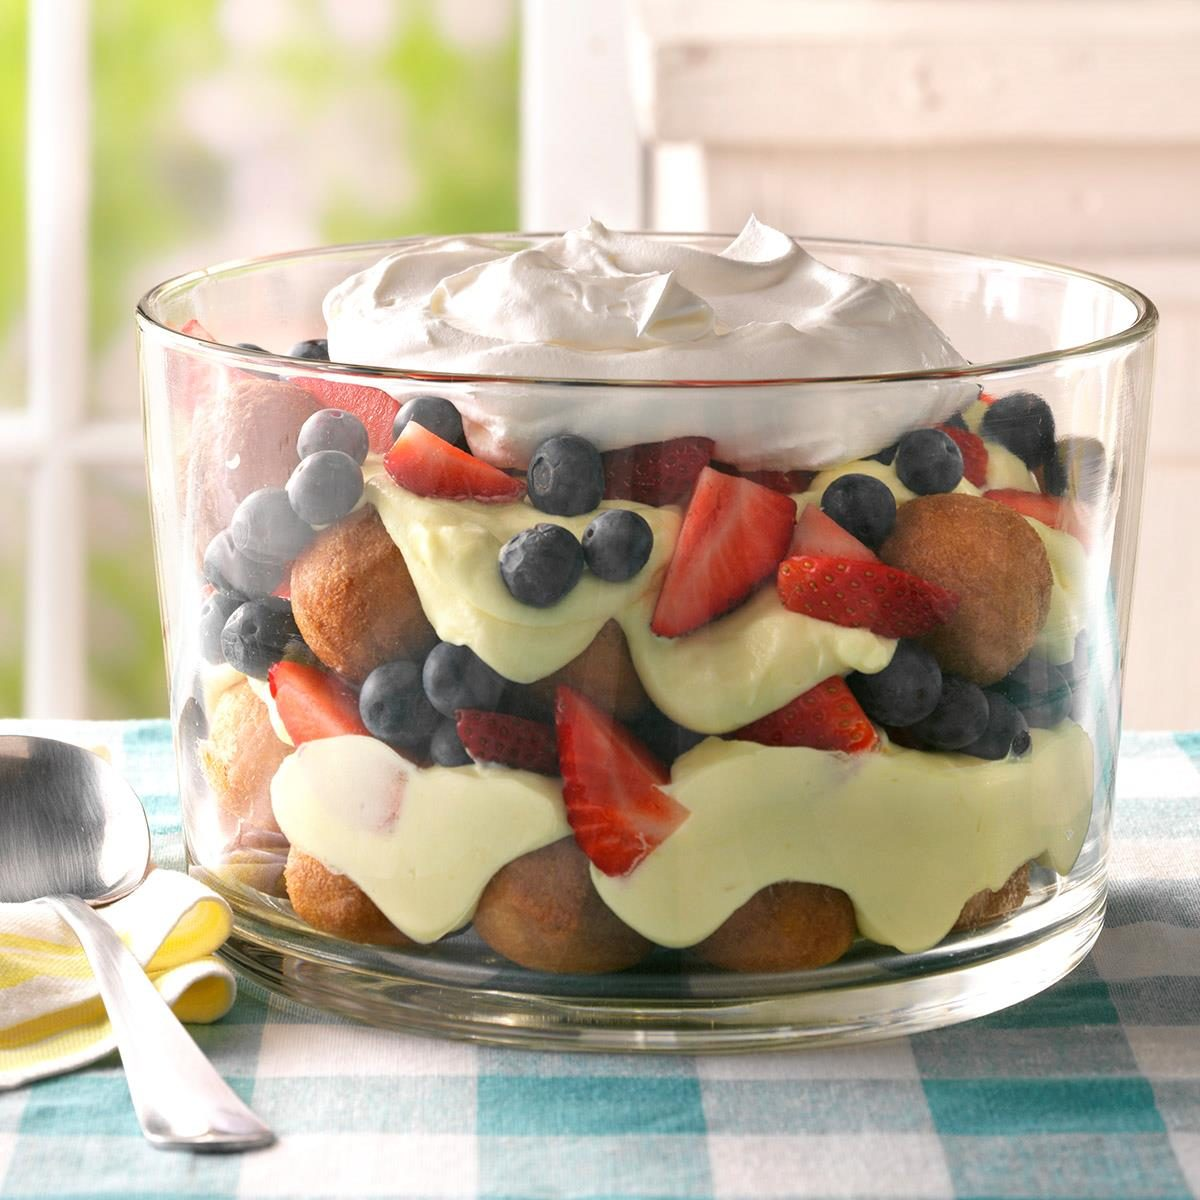 Berry, Lemon and Doughnut Hole Trifle